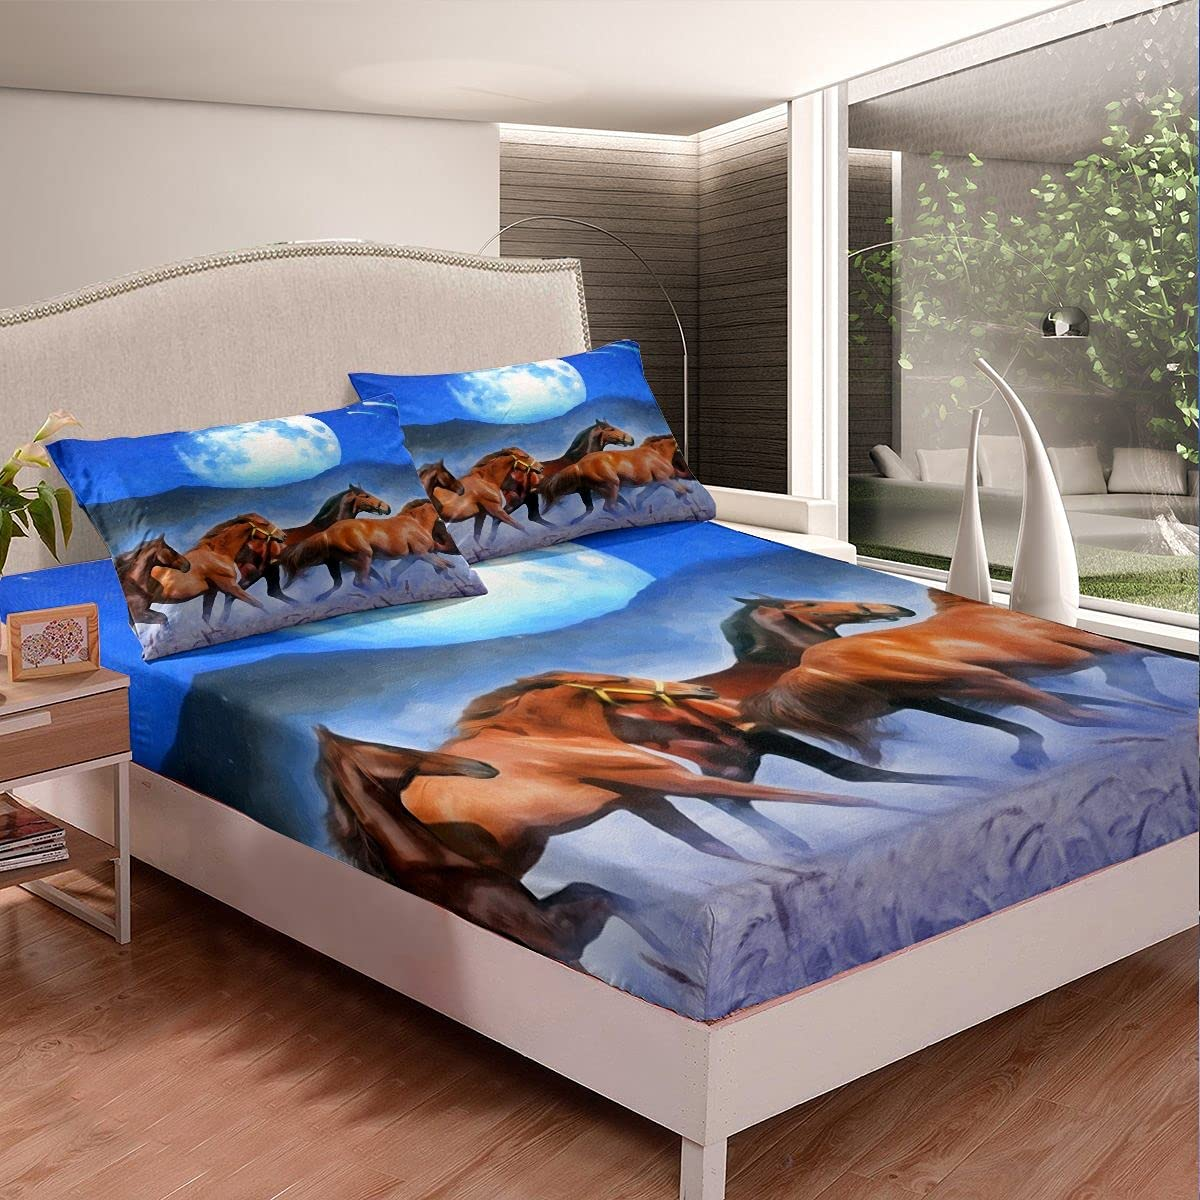 Erosebridal Kids Horse Fitted Bed Sheets Bedding Fashionable Max 68% OFF Se Animal Farm